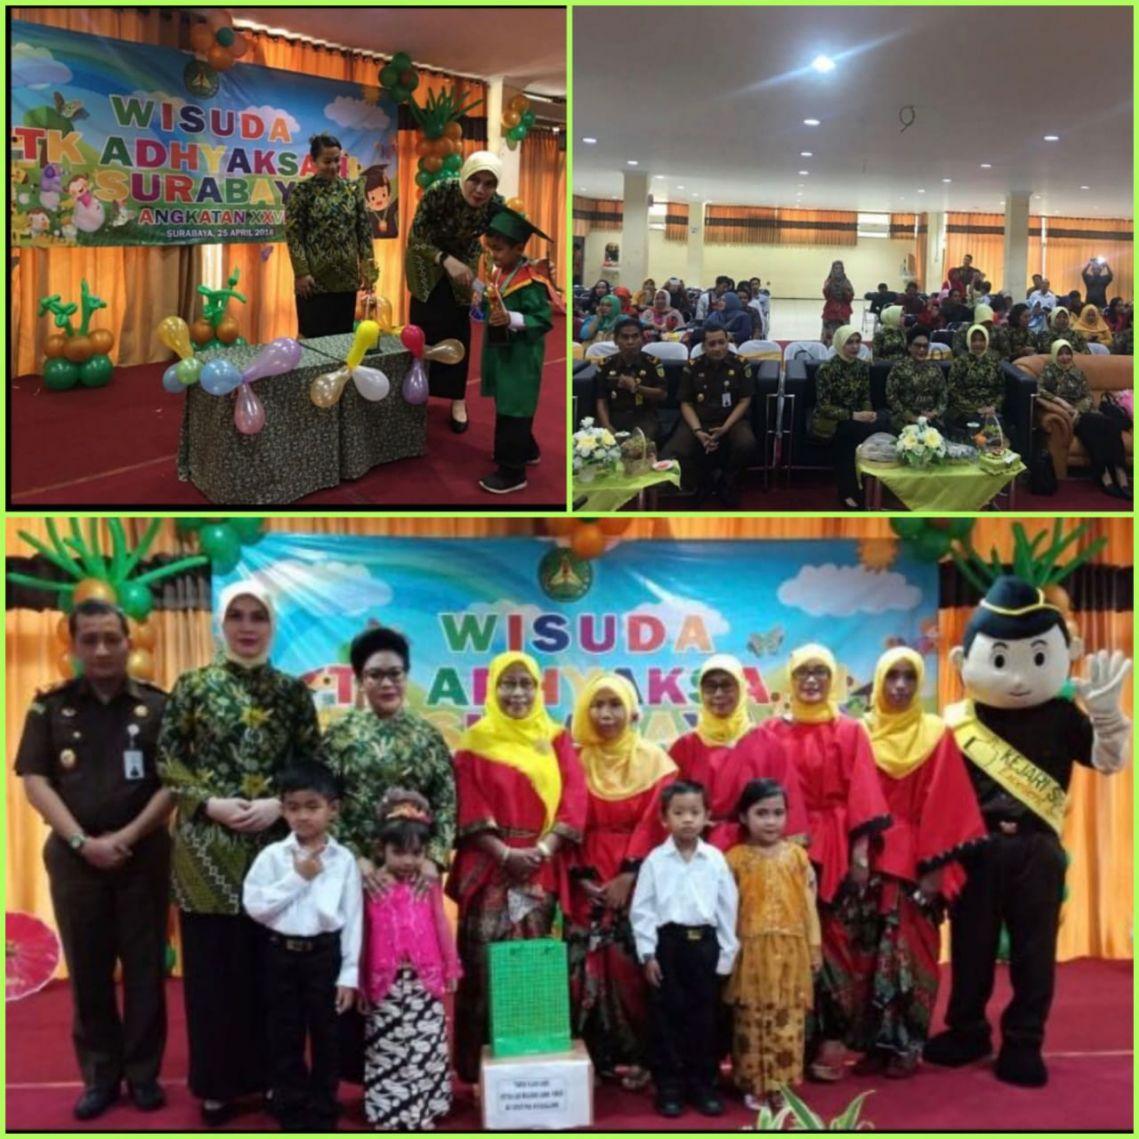 Wisuda TK Adhyaksa Surabaya 25-04-2018